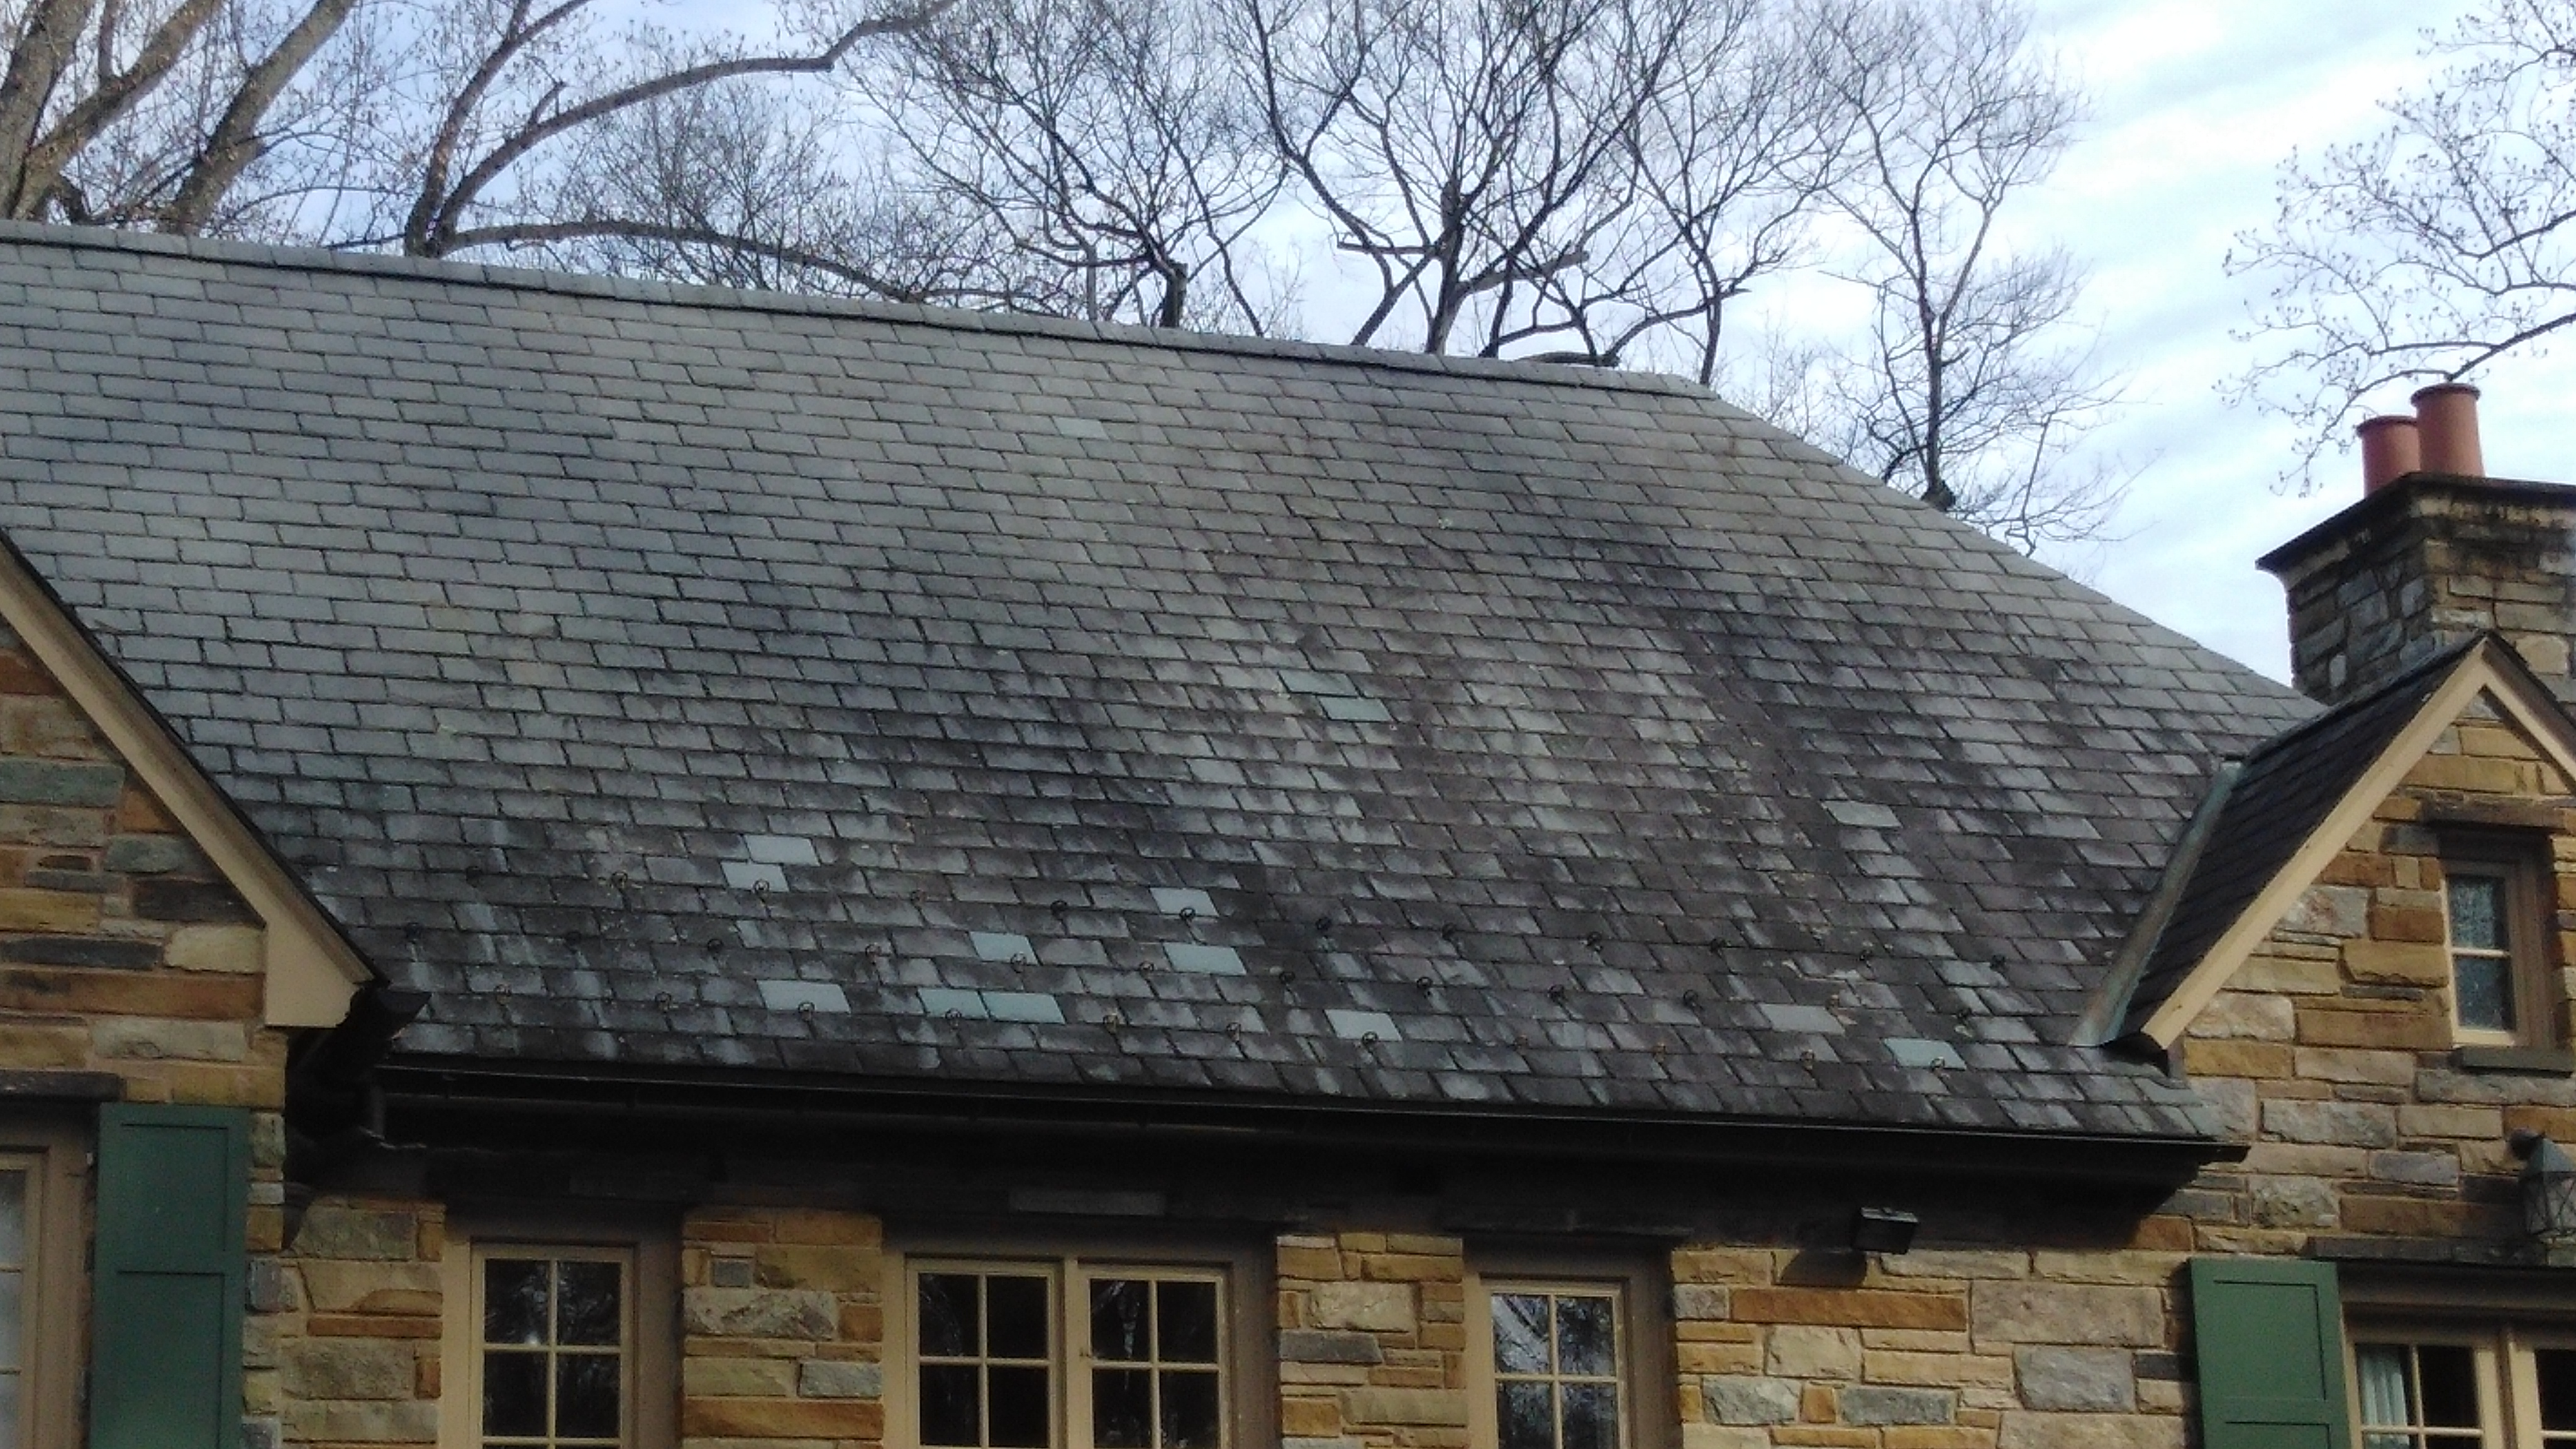 Slate Roof Cleaning Mclean Va 22103 Non Pressure Tile